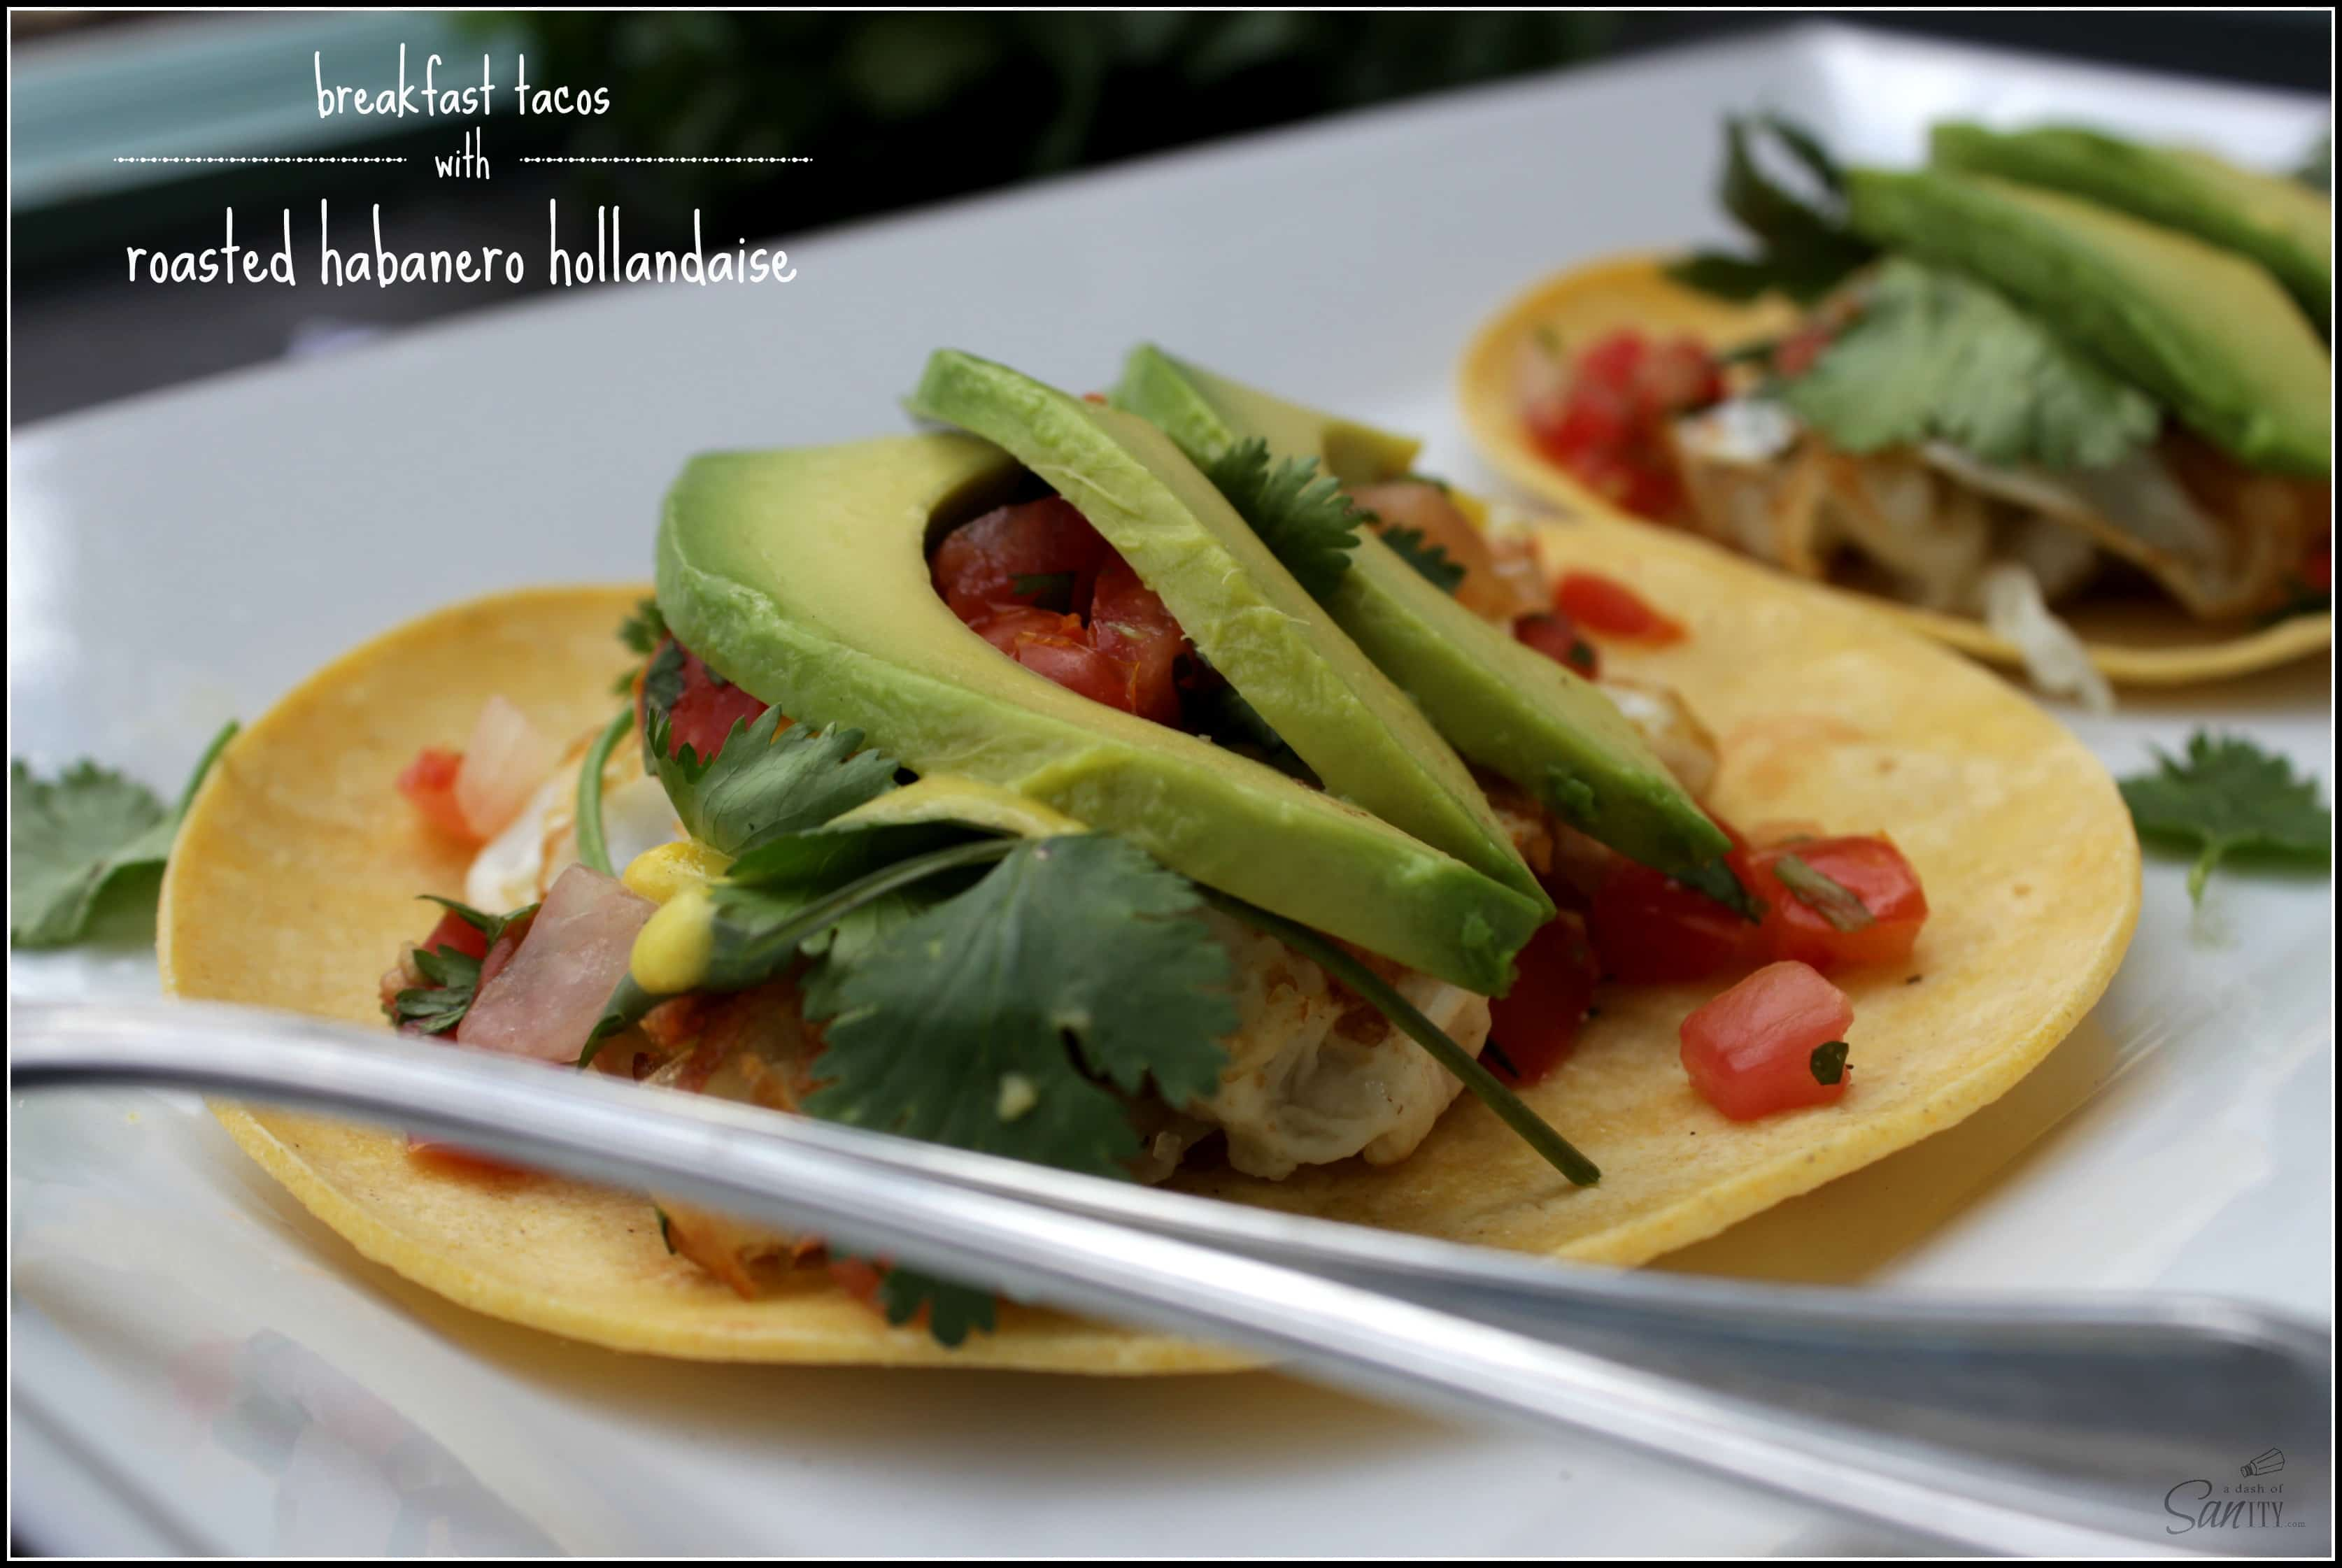 Breakfast Tacos with Roasted Habanero Hollandaise